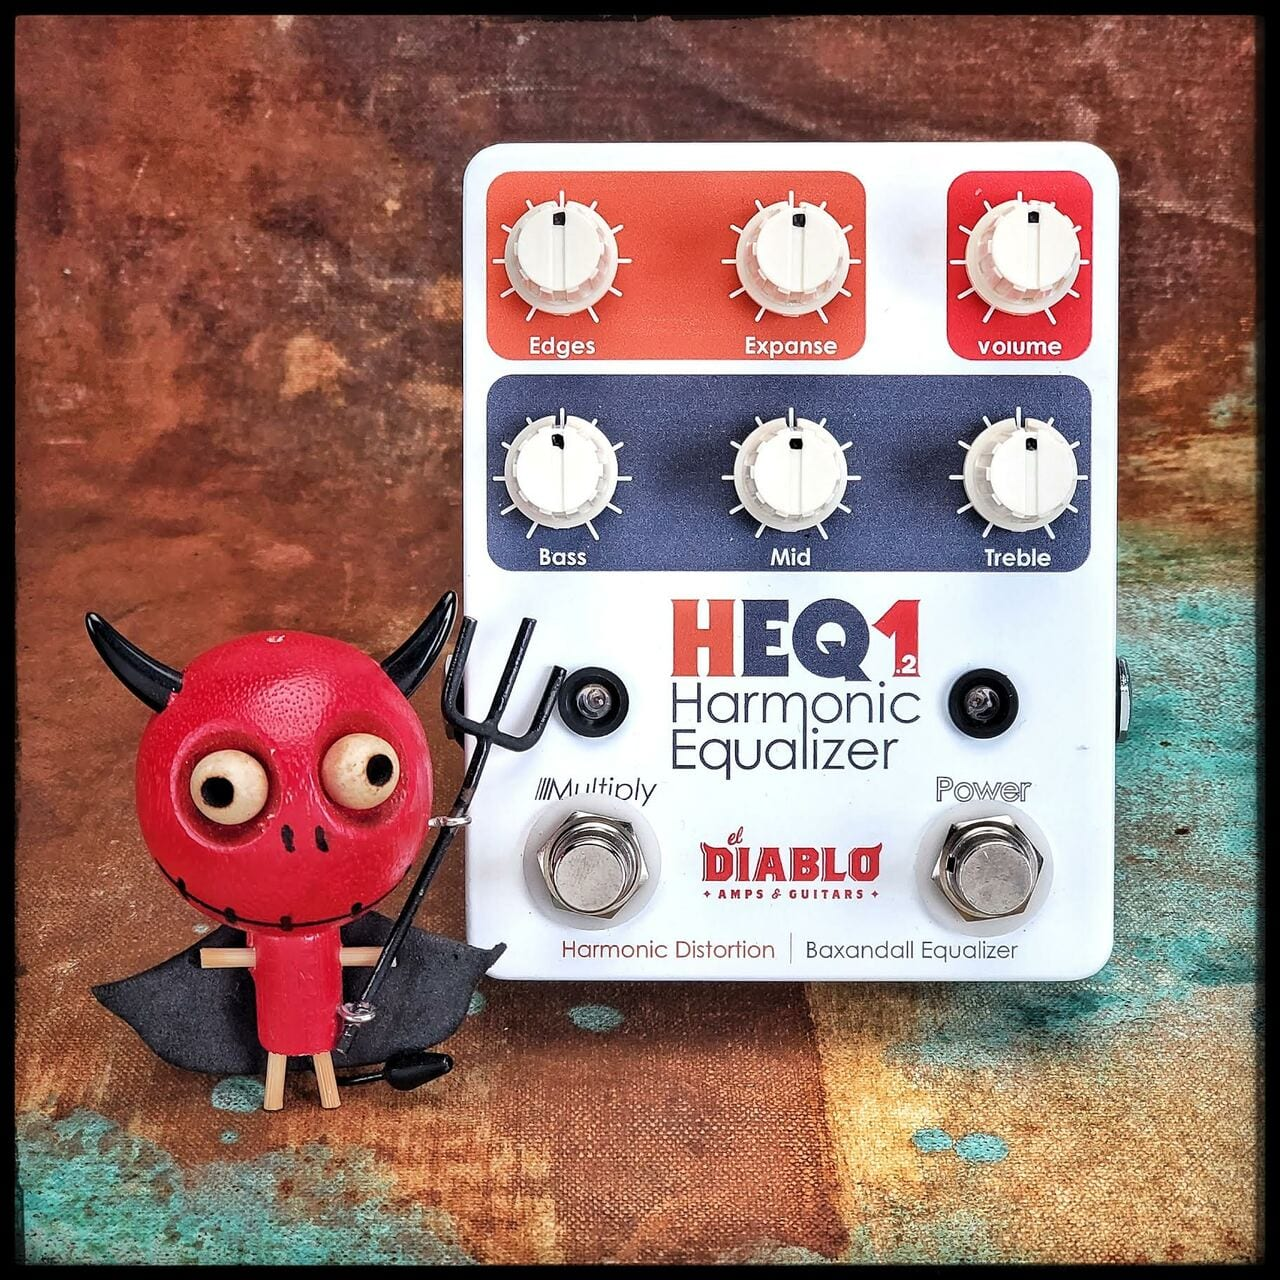 El Diablo Amps & Guitars' new HEQ1.2 Harmonic Equalizer fuzz